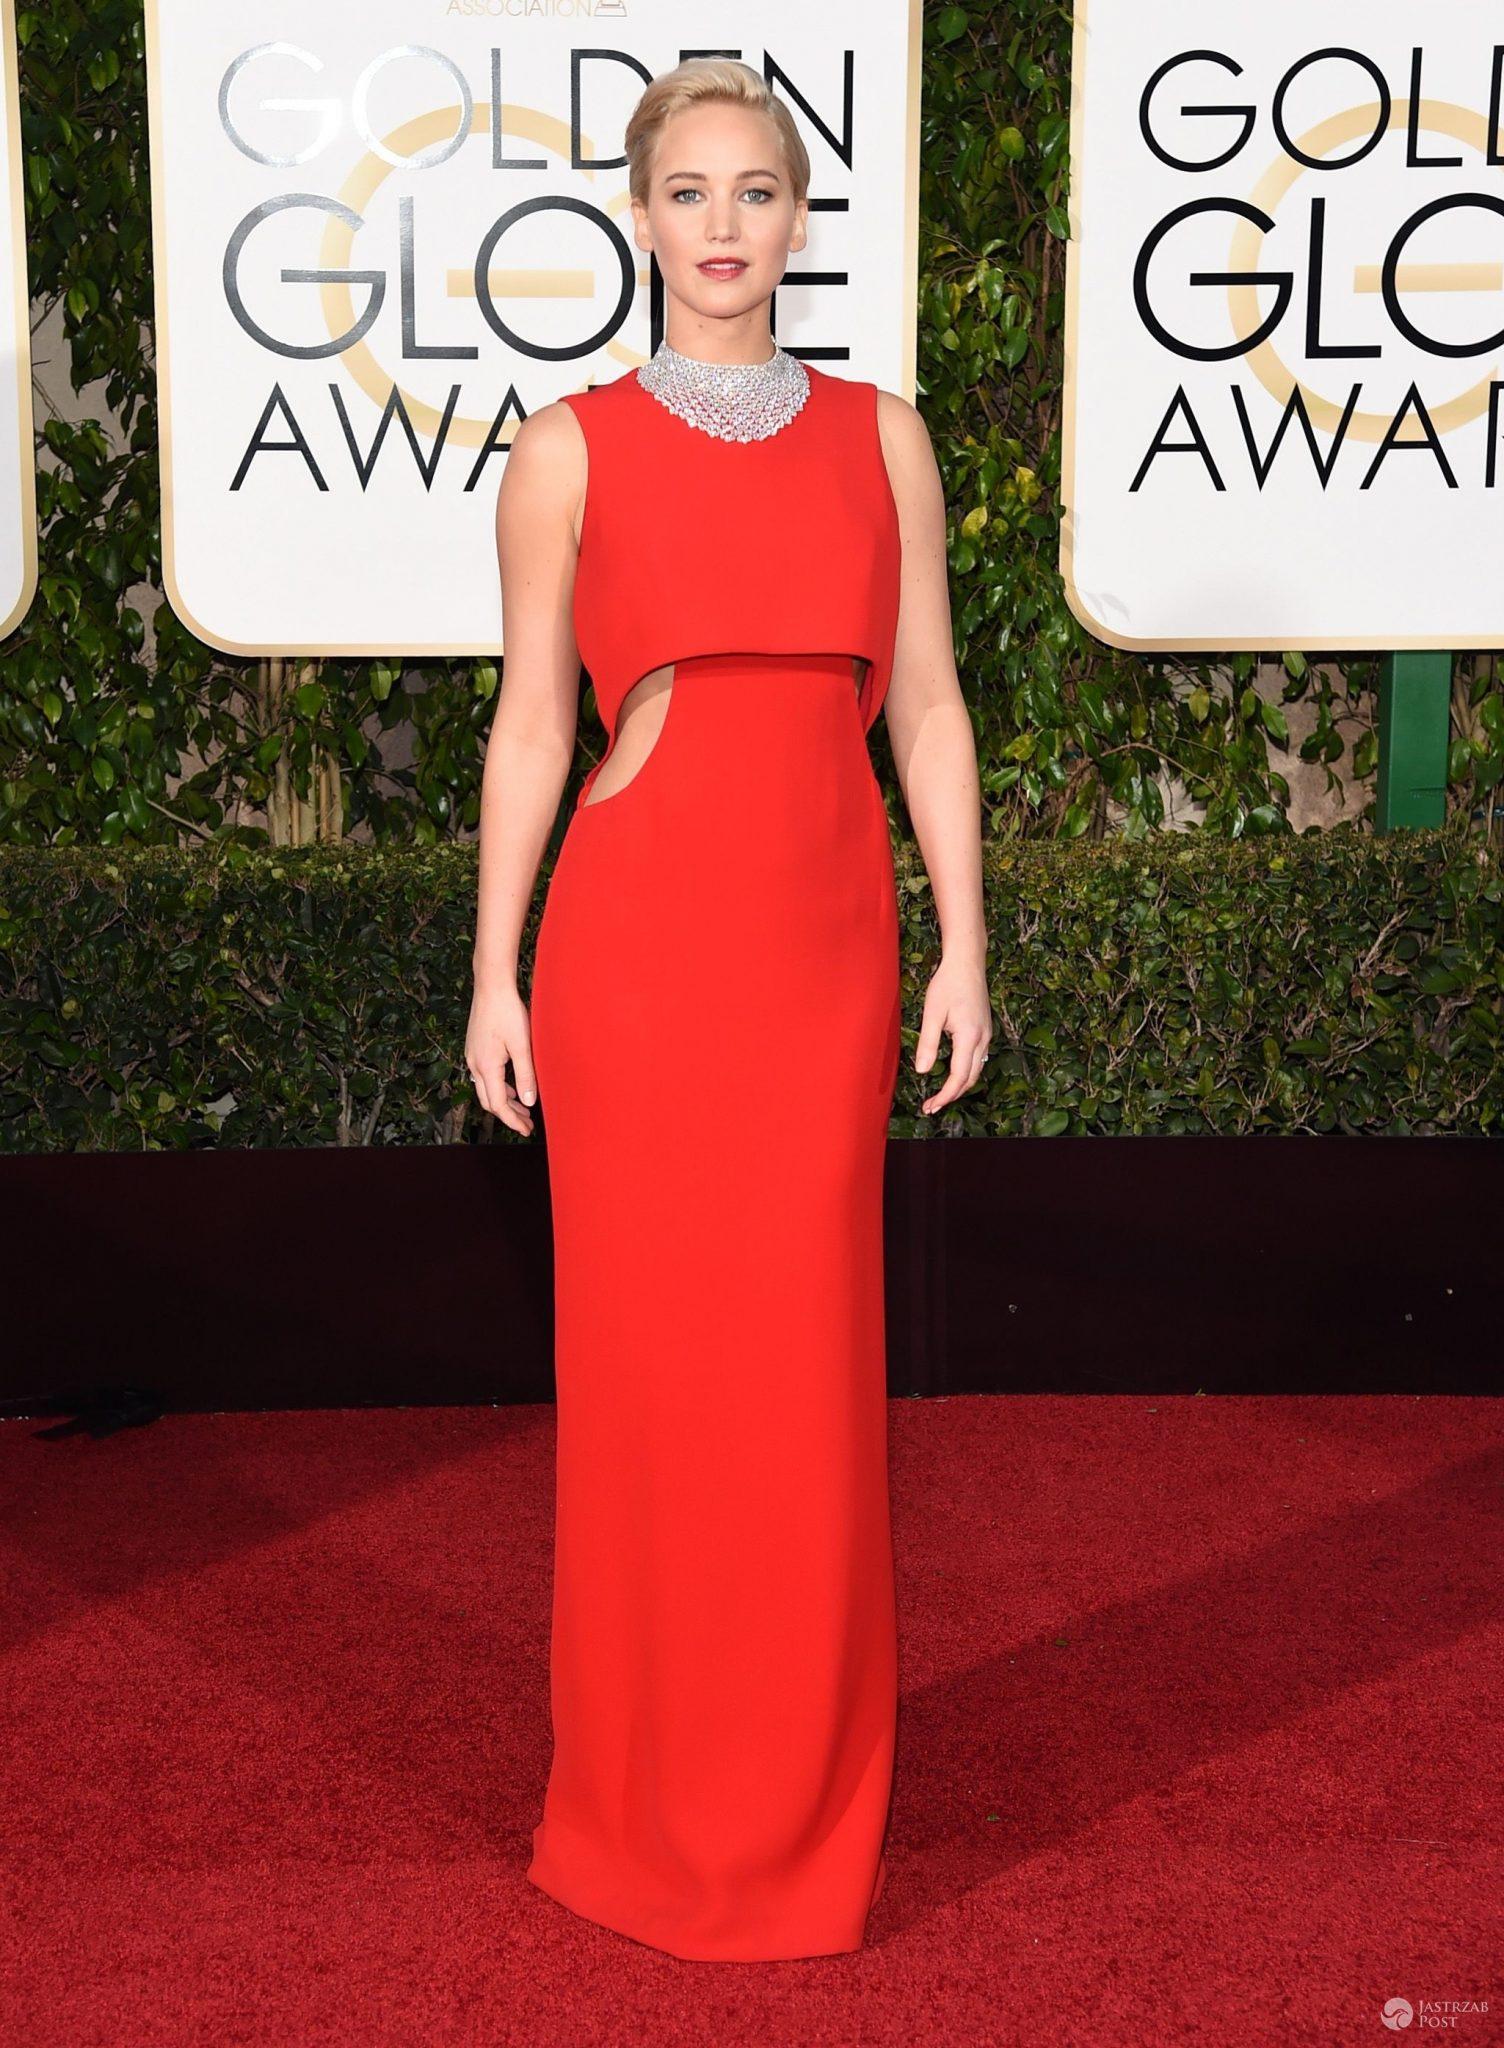 Kreacja: Dior. Jennifer Lawrence, Złote Globy 2016 (fot. East News)